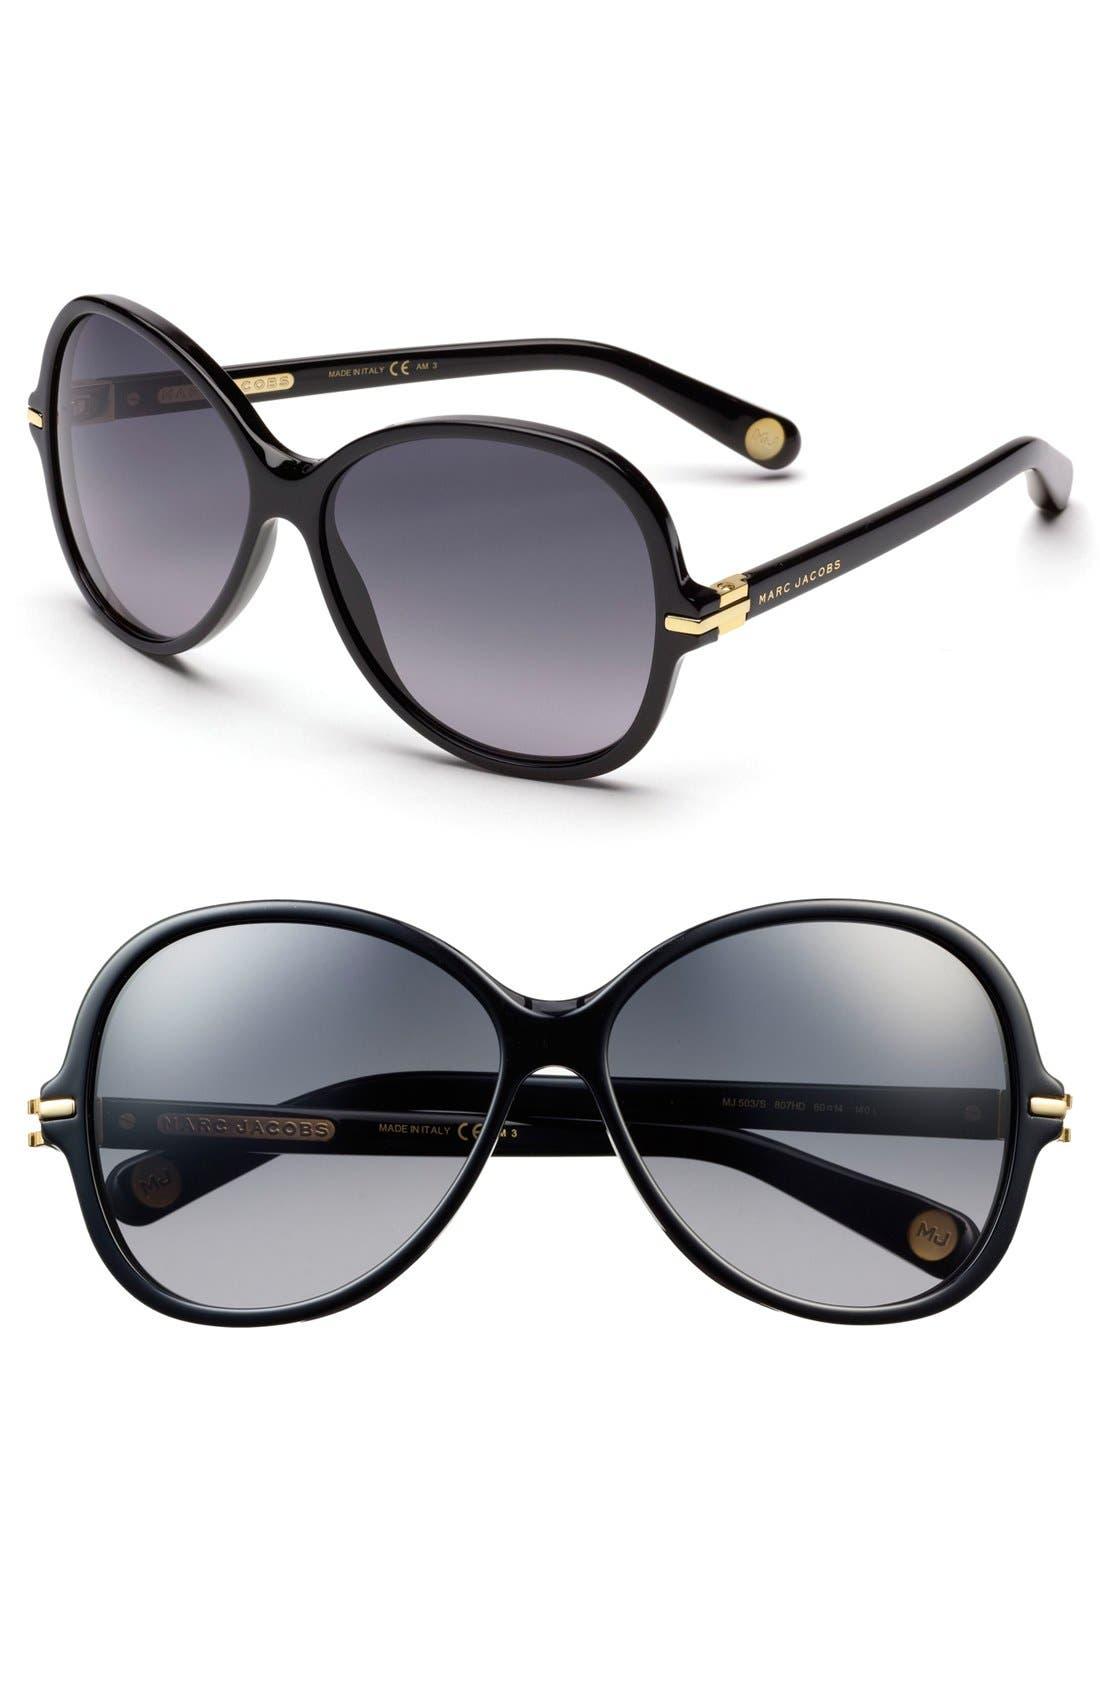 MARC JACOBS, 60mm Sunglasses, Main thumbnail 1, color, 001